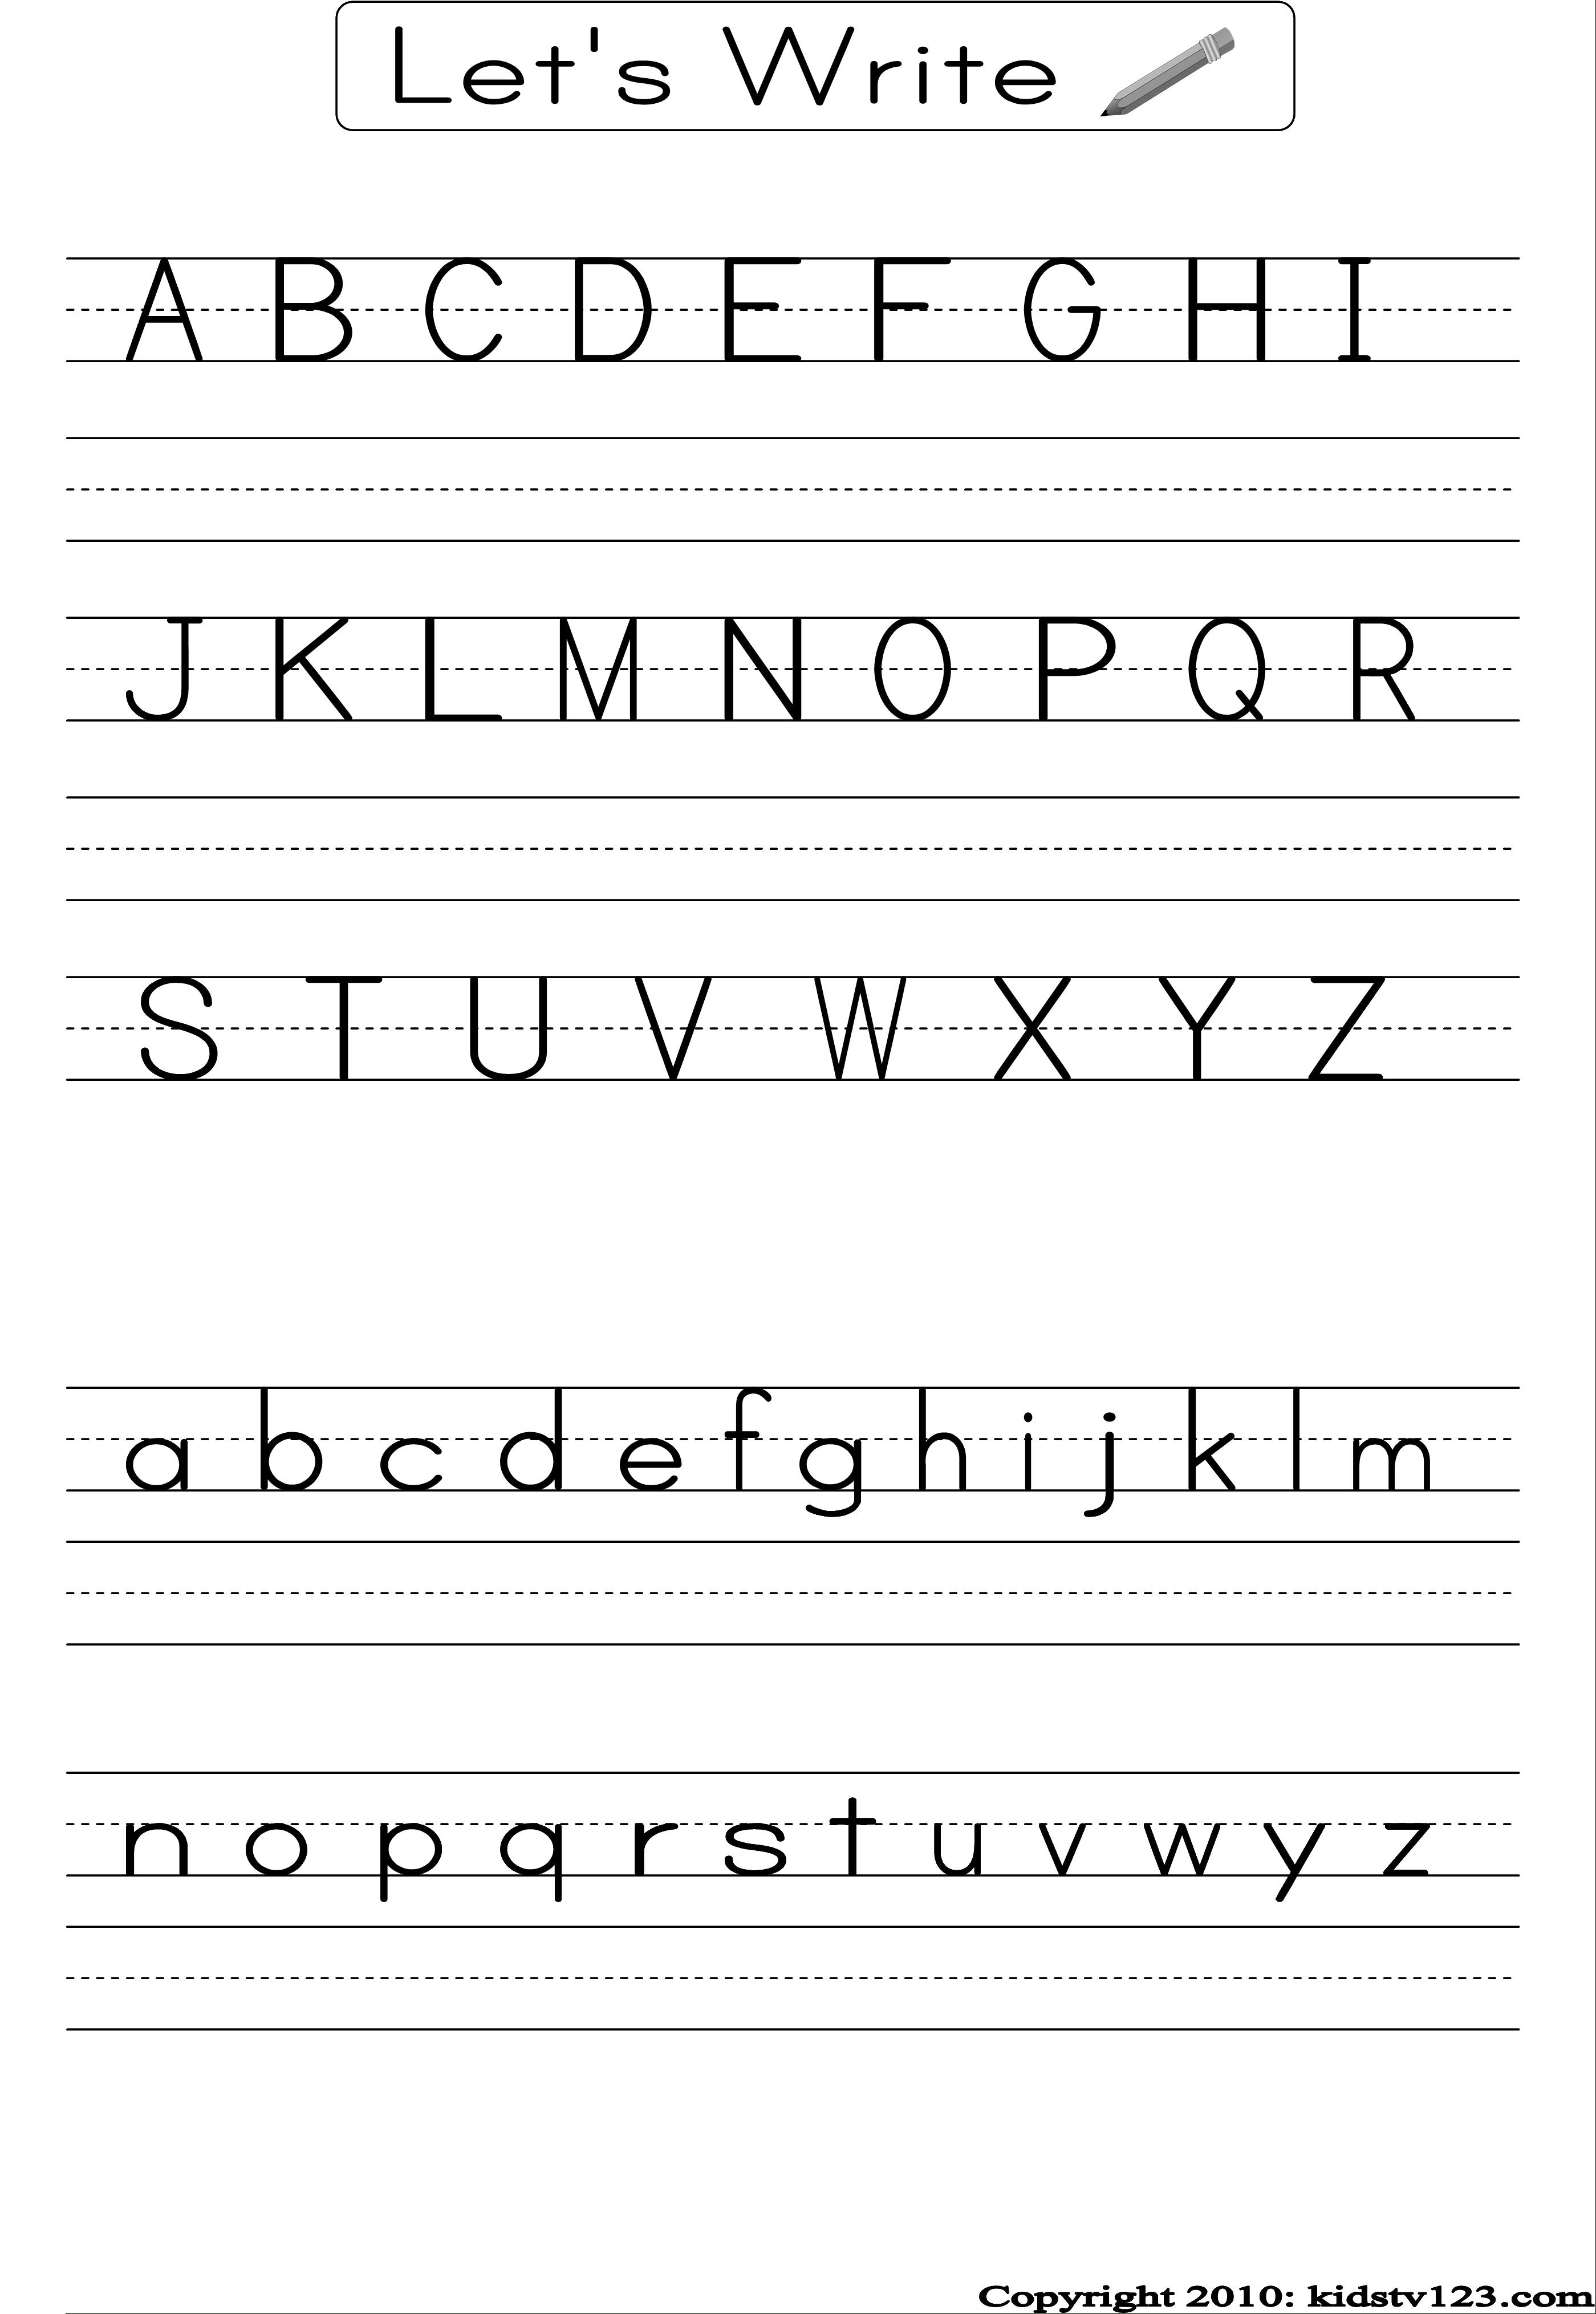 Alphabet Writing Practice Sheet   Edu-Fun   Alphabet Worksheets   Printable Alphabet Worksheets